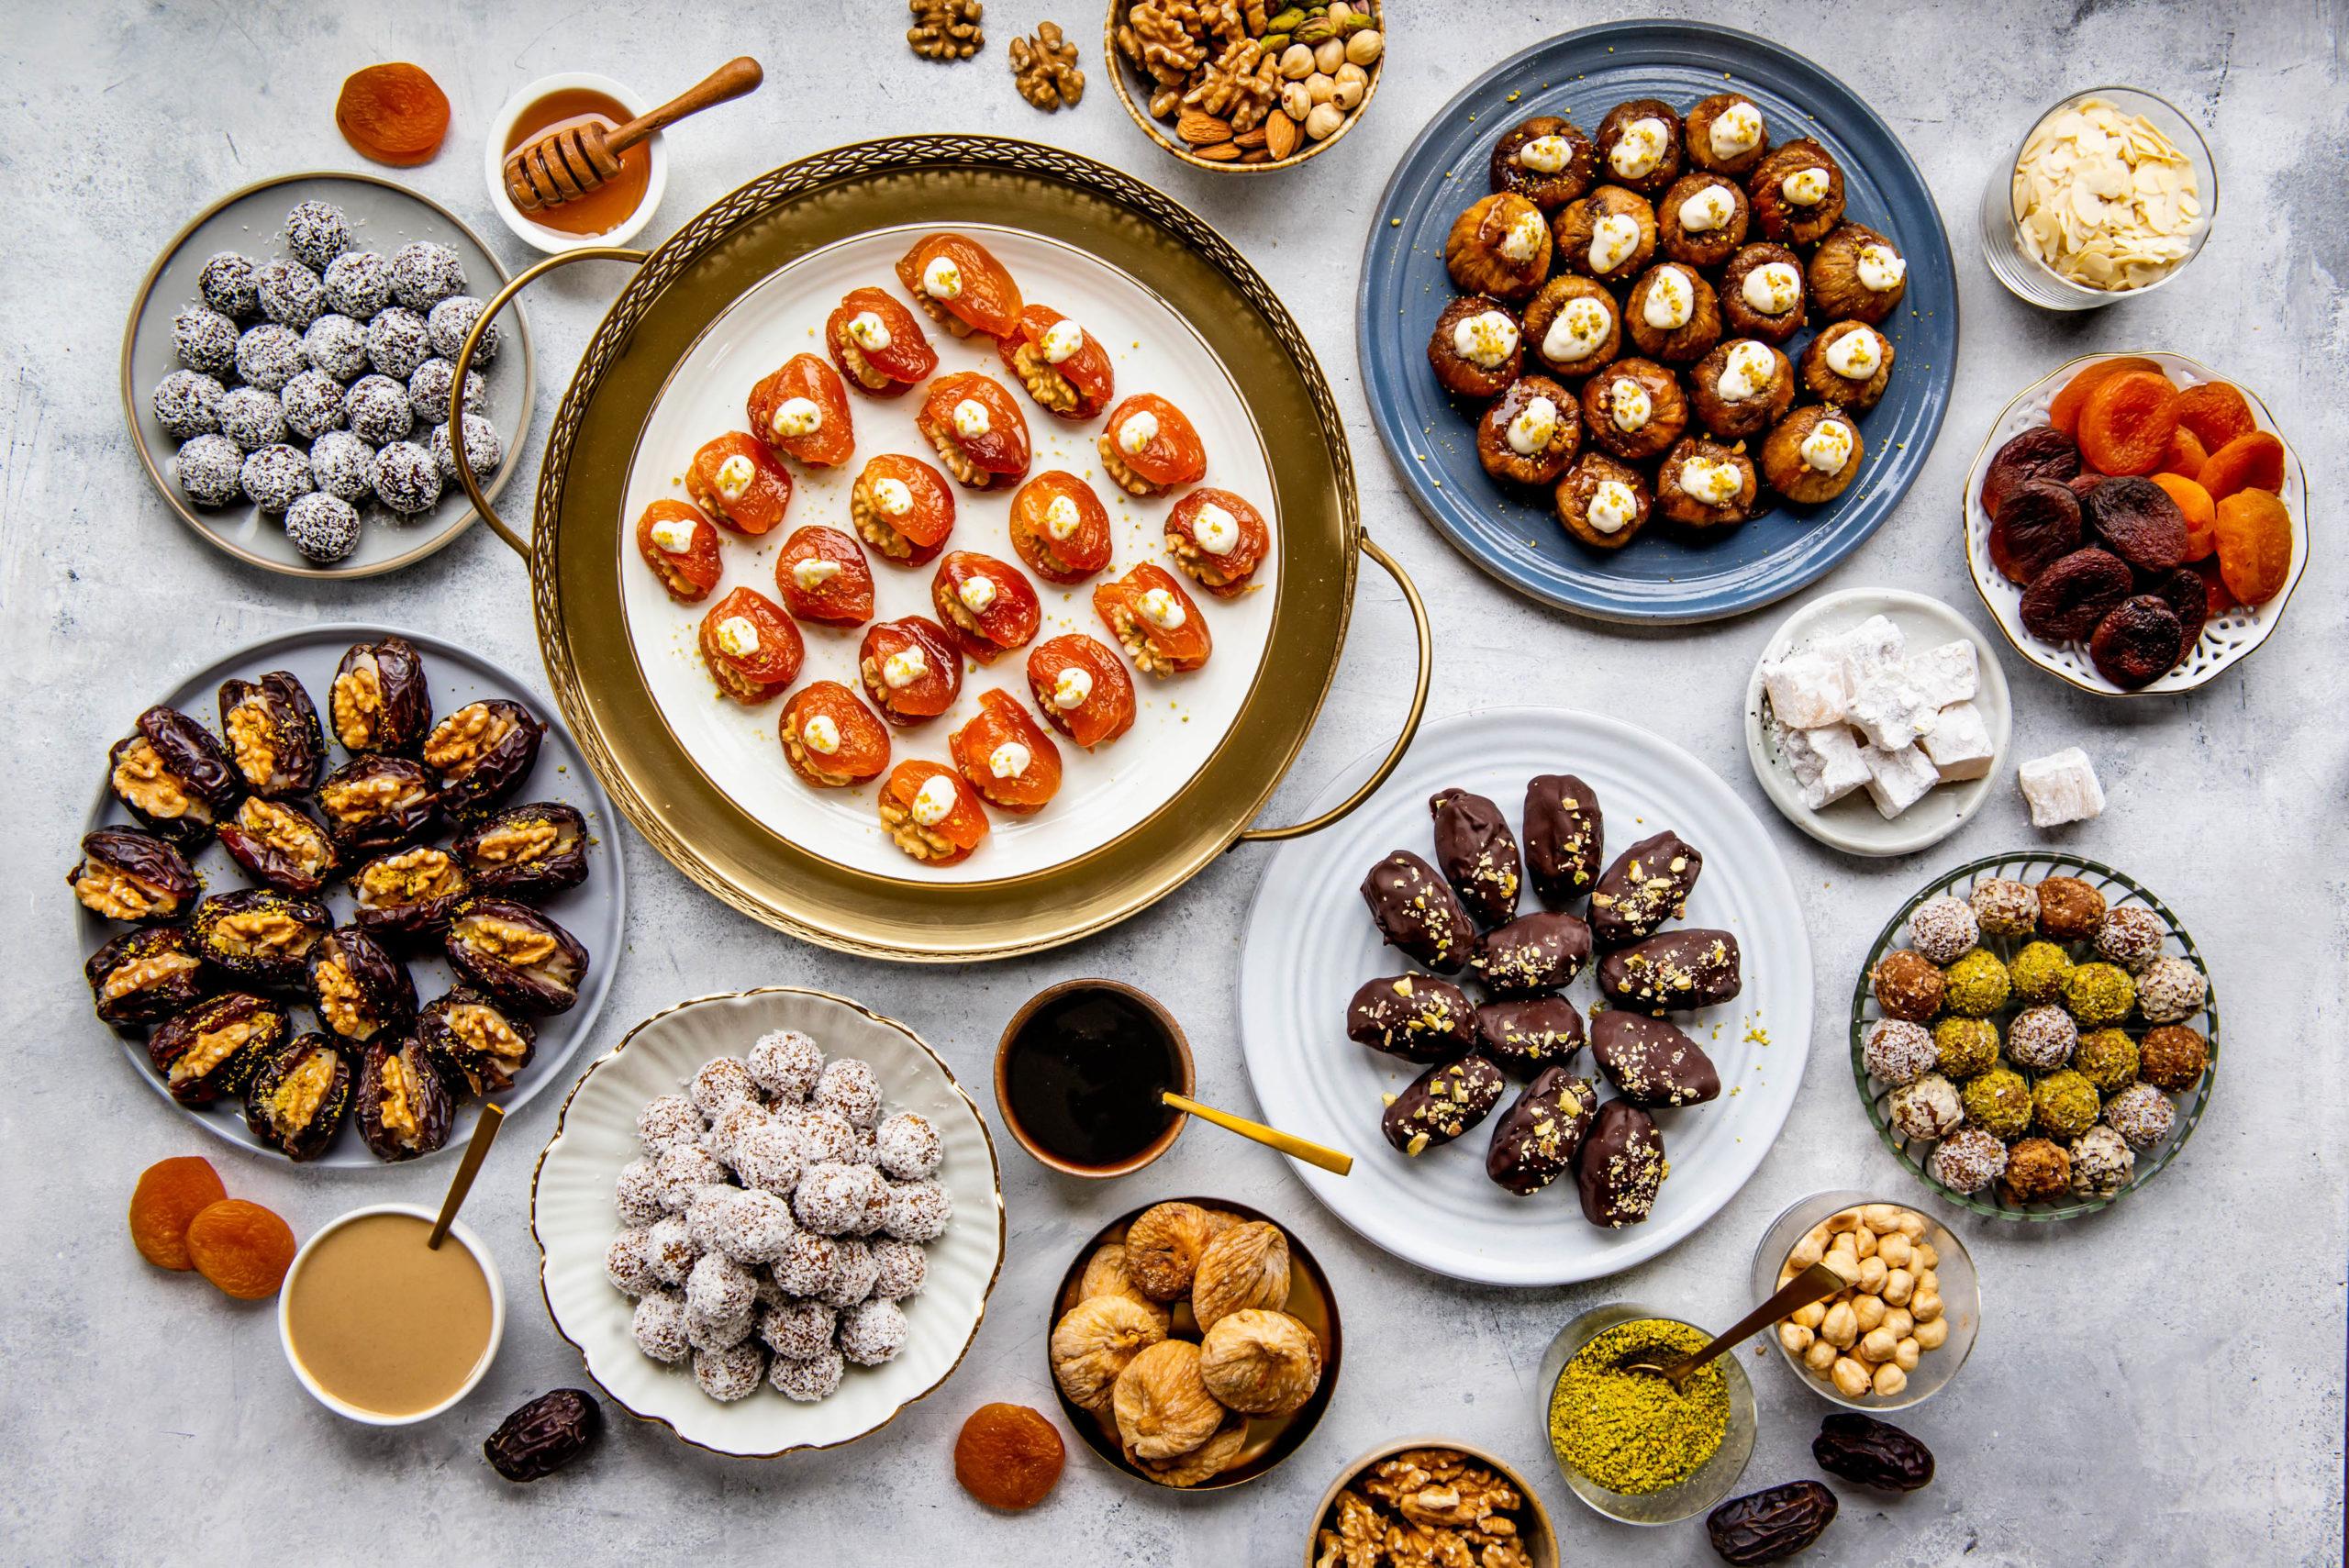 Miras Ramadan hapjes gedroogde vruchten suikerfeest Stefanie Spoelder foodfotograaf foodfotografie food photography